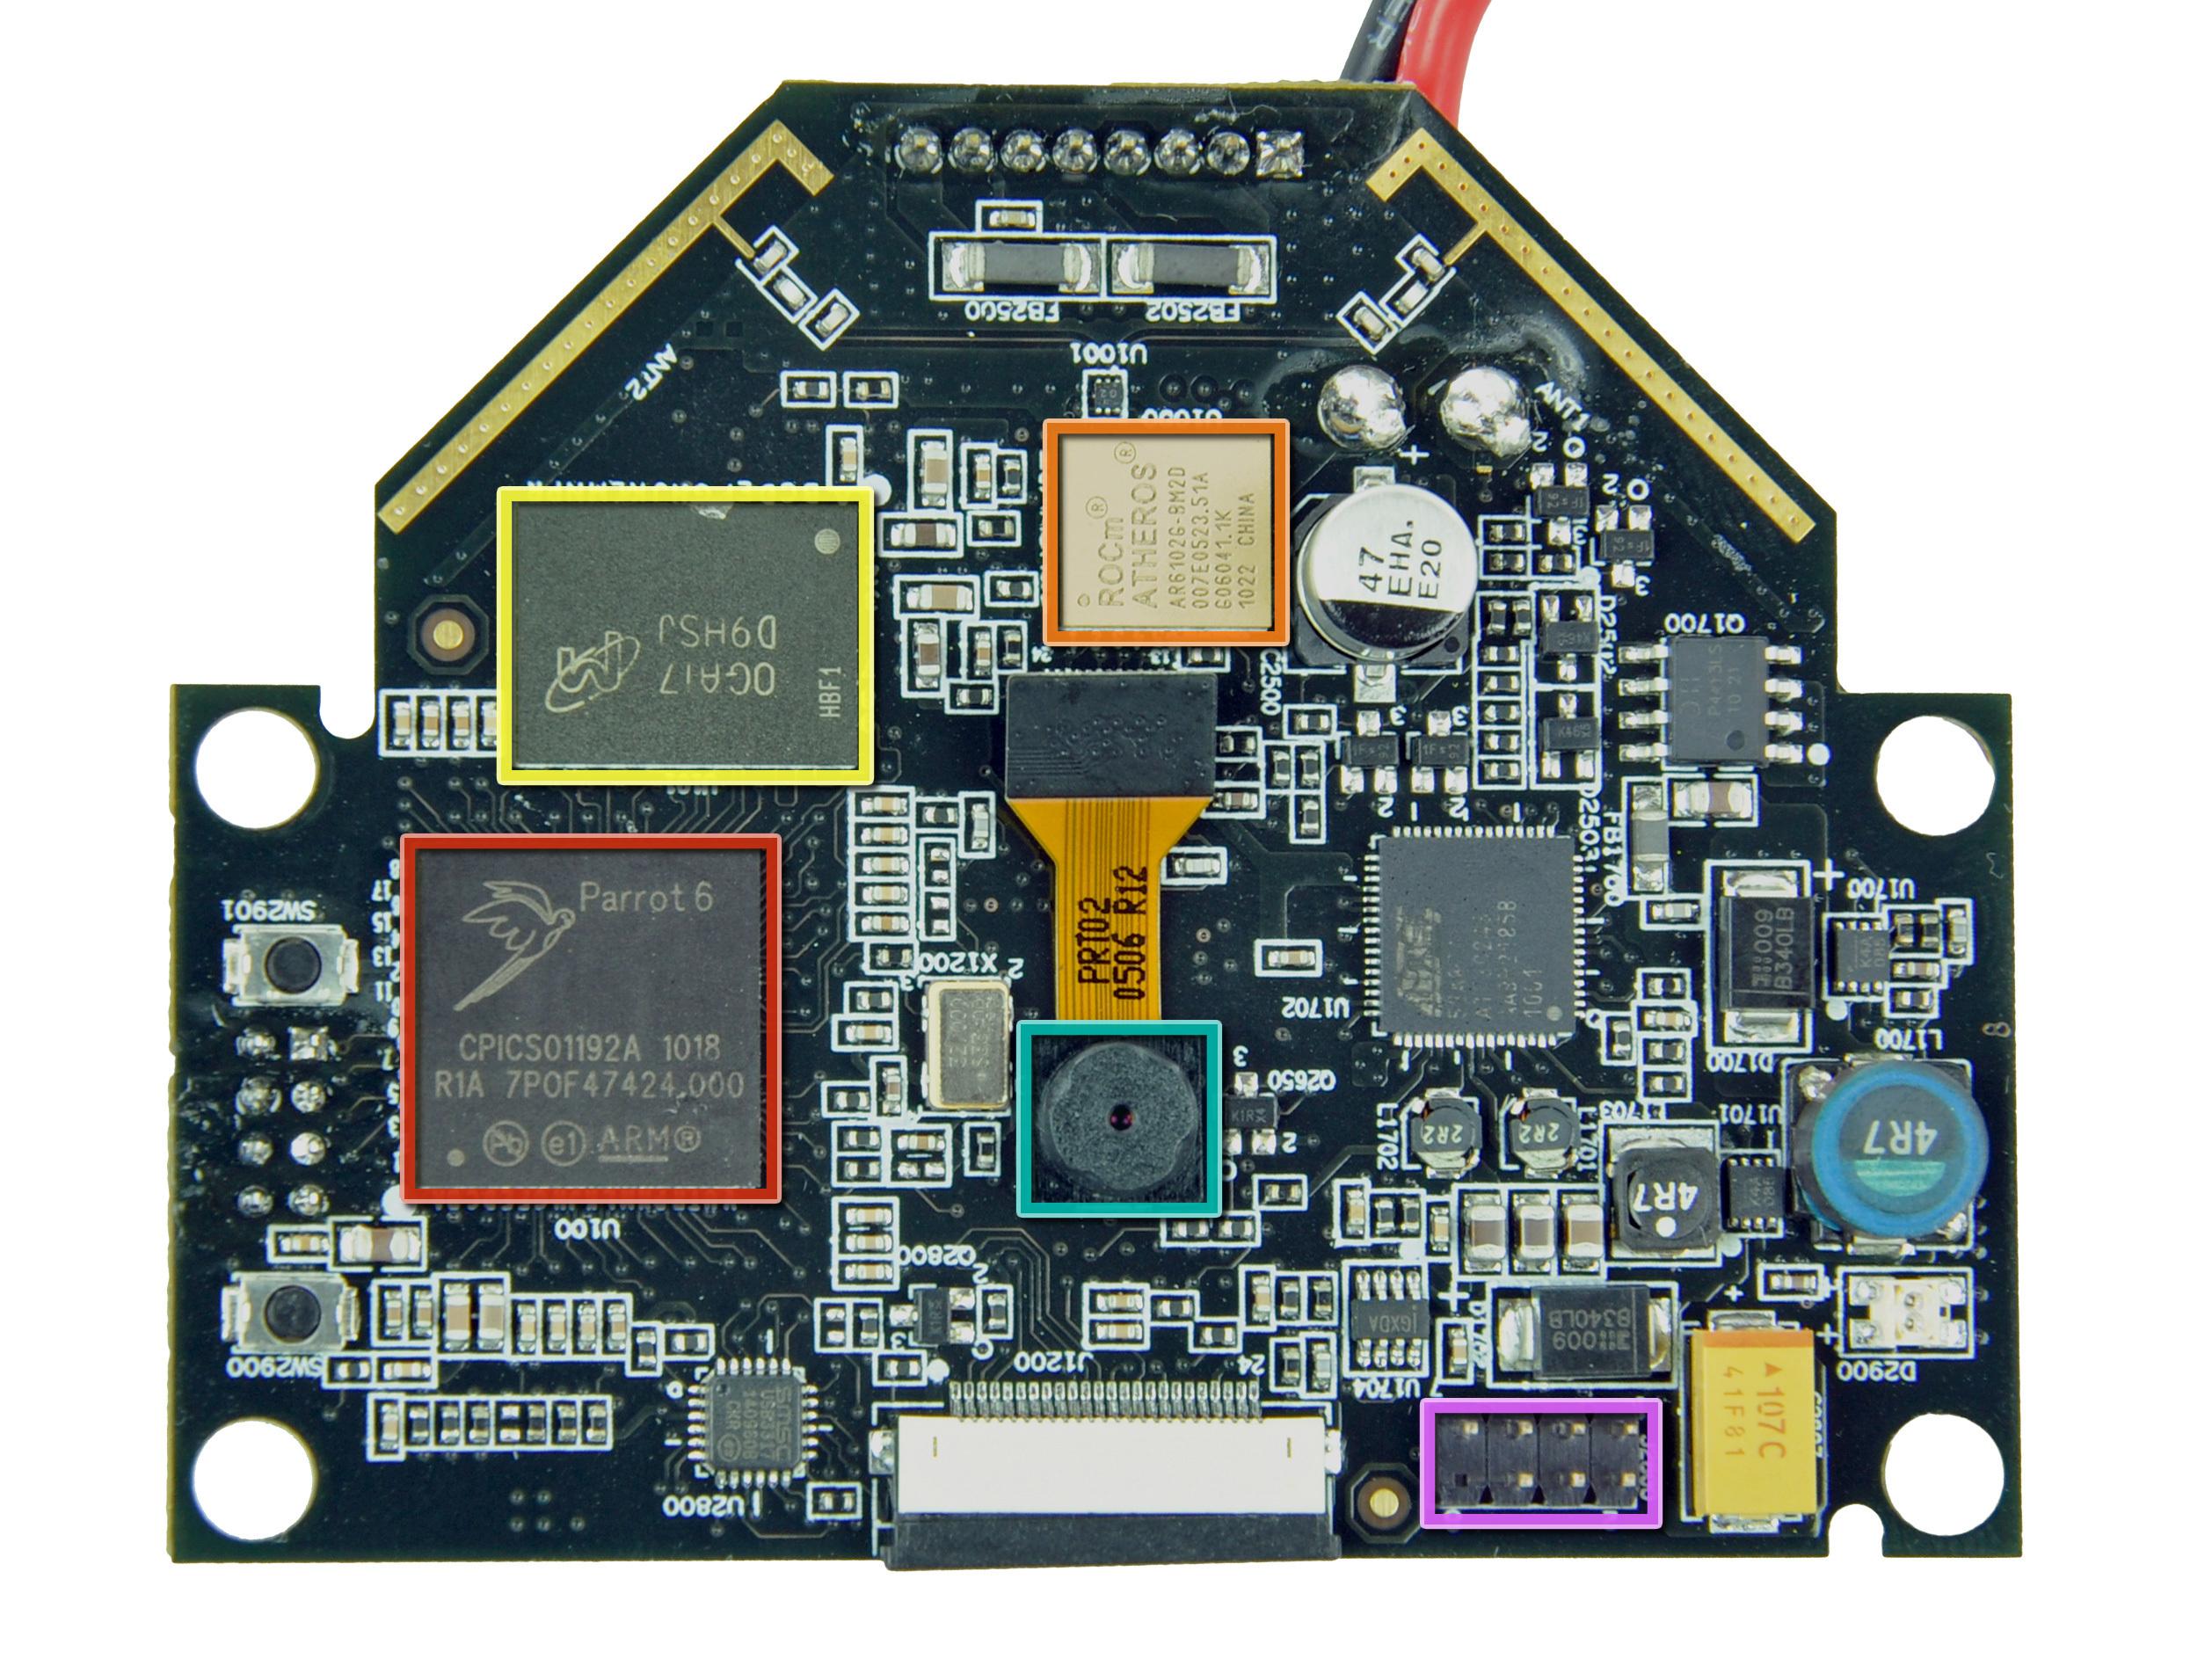 parrot ar drone repair ifixit rh ifixit com Ar.drone 2.0 Review AR.Drone 2.0 Quadricopter Power Edition